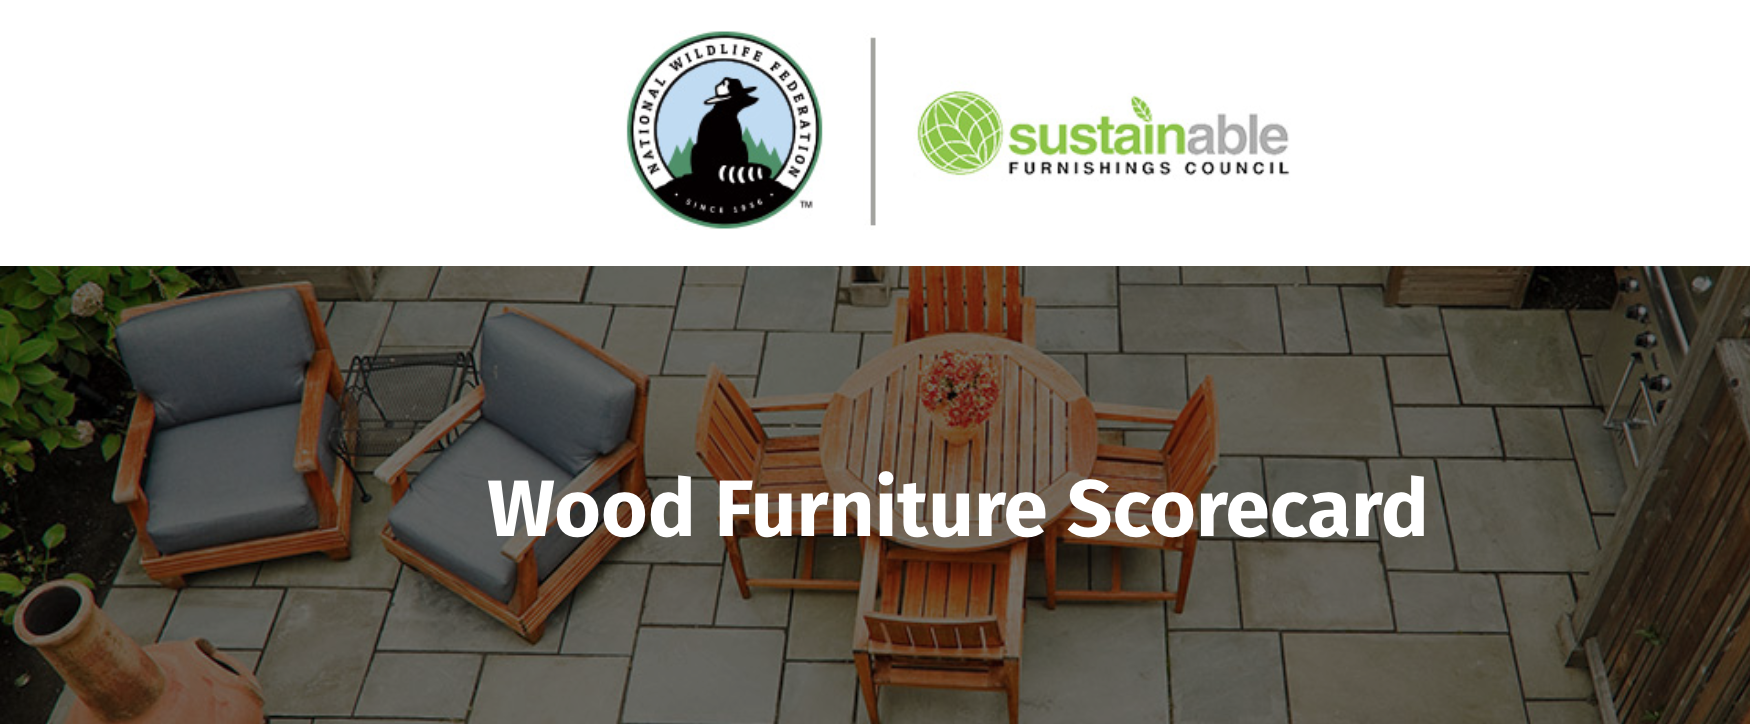 Wood Furniture Scorecard